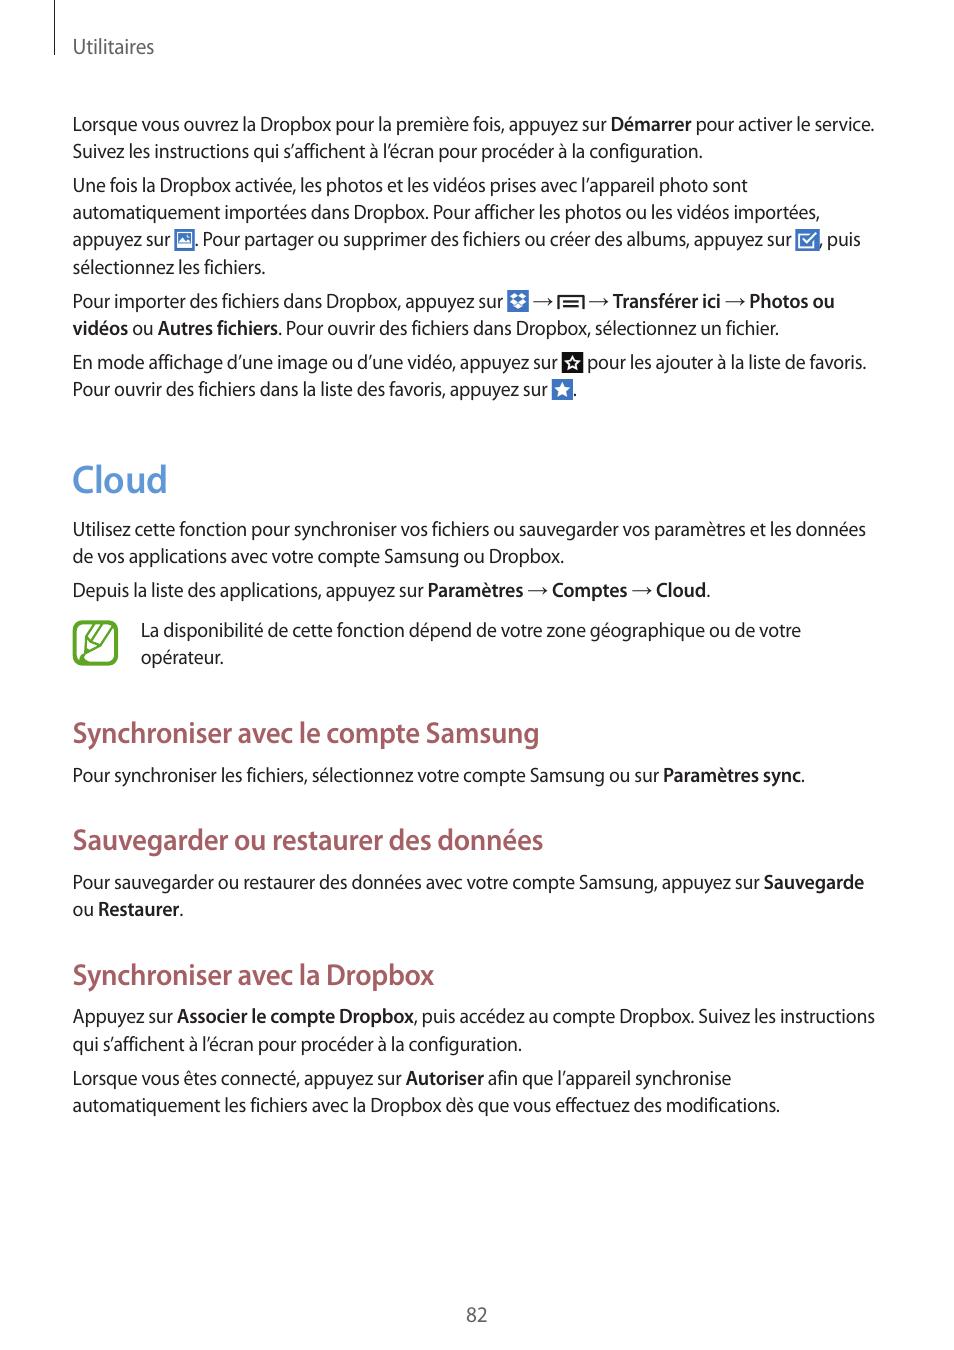 82 cloud, Cloud, Synchroniser avec le compte samsung | Samsung GT